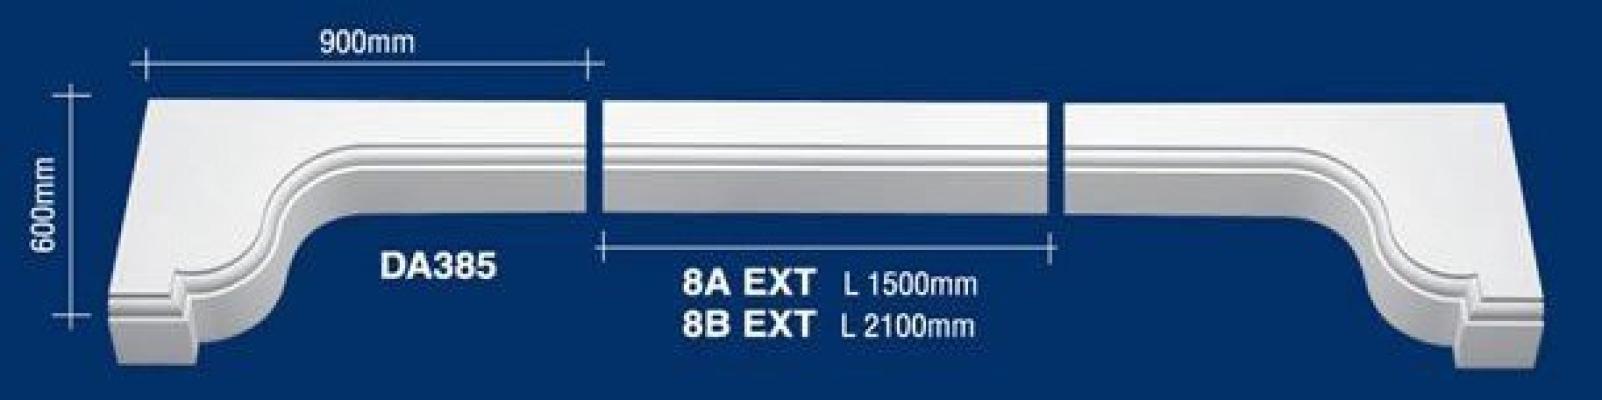 8B EXT